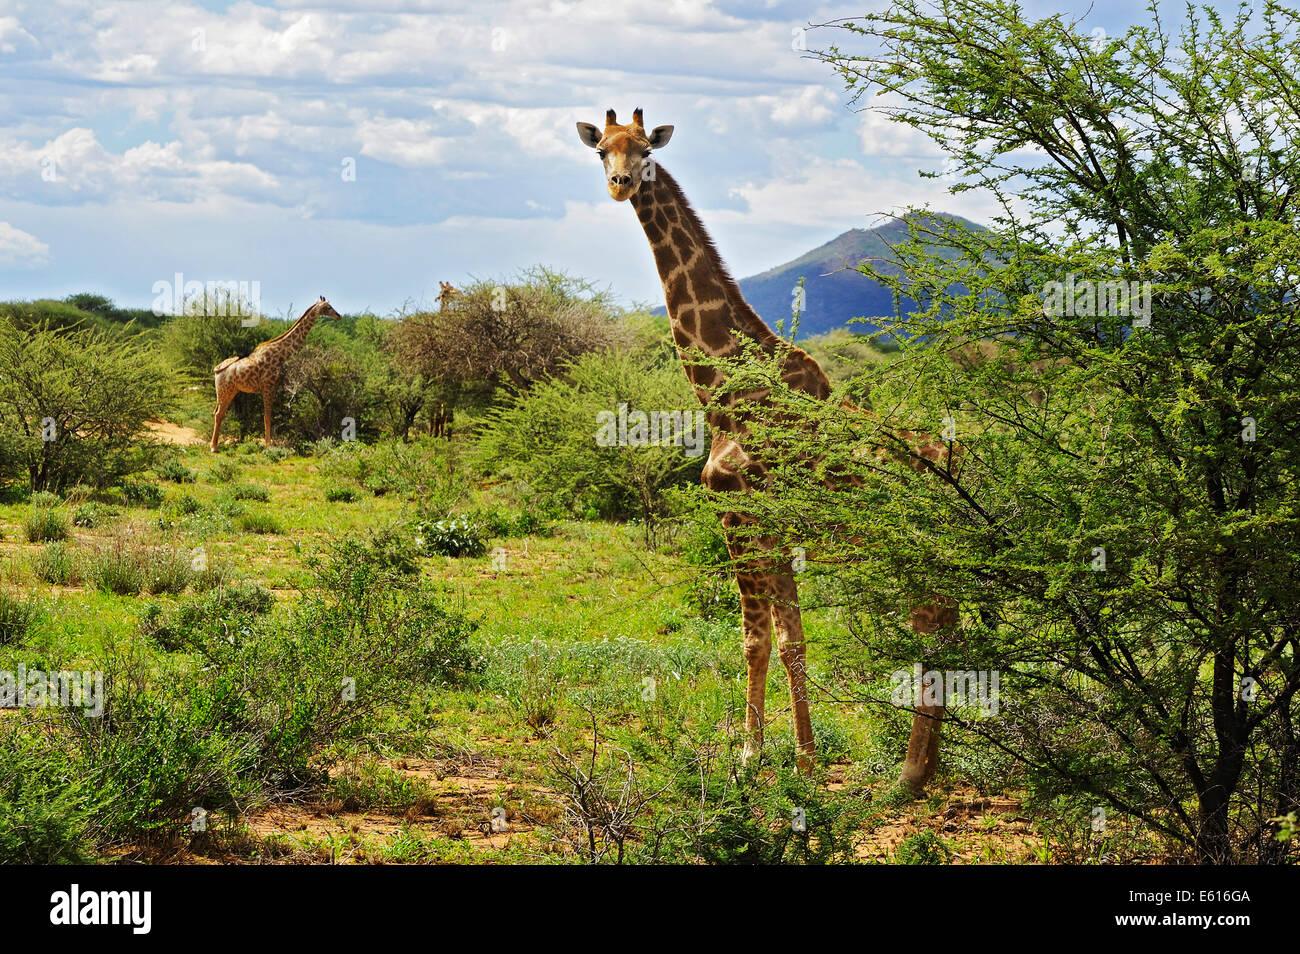 Il Savannah con le giraffe (Giraffa camelopardalis) in Okahandja, Namibia Immagini Stock